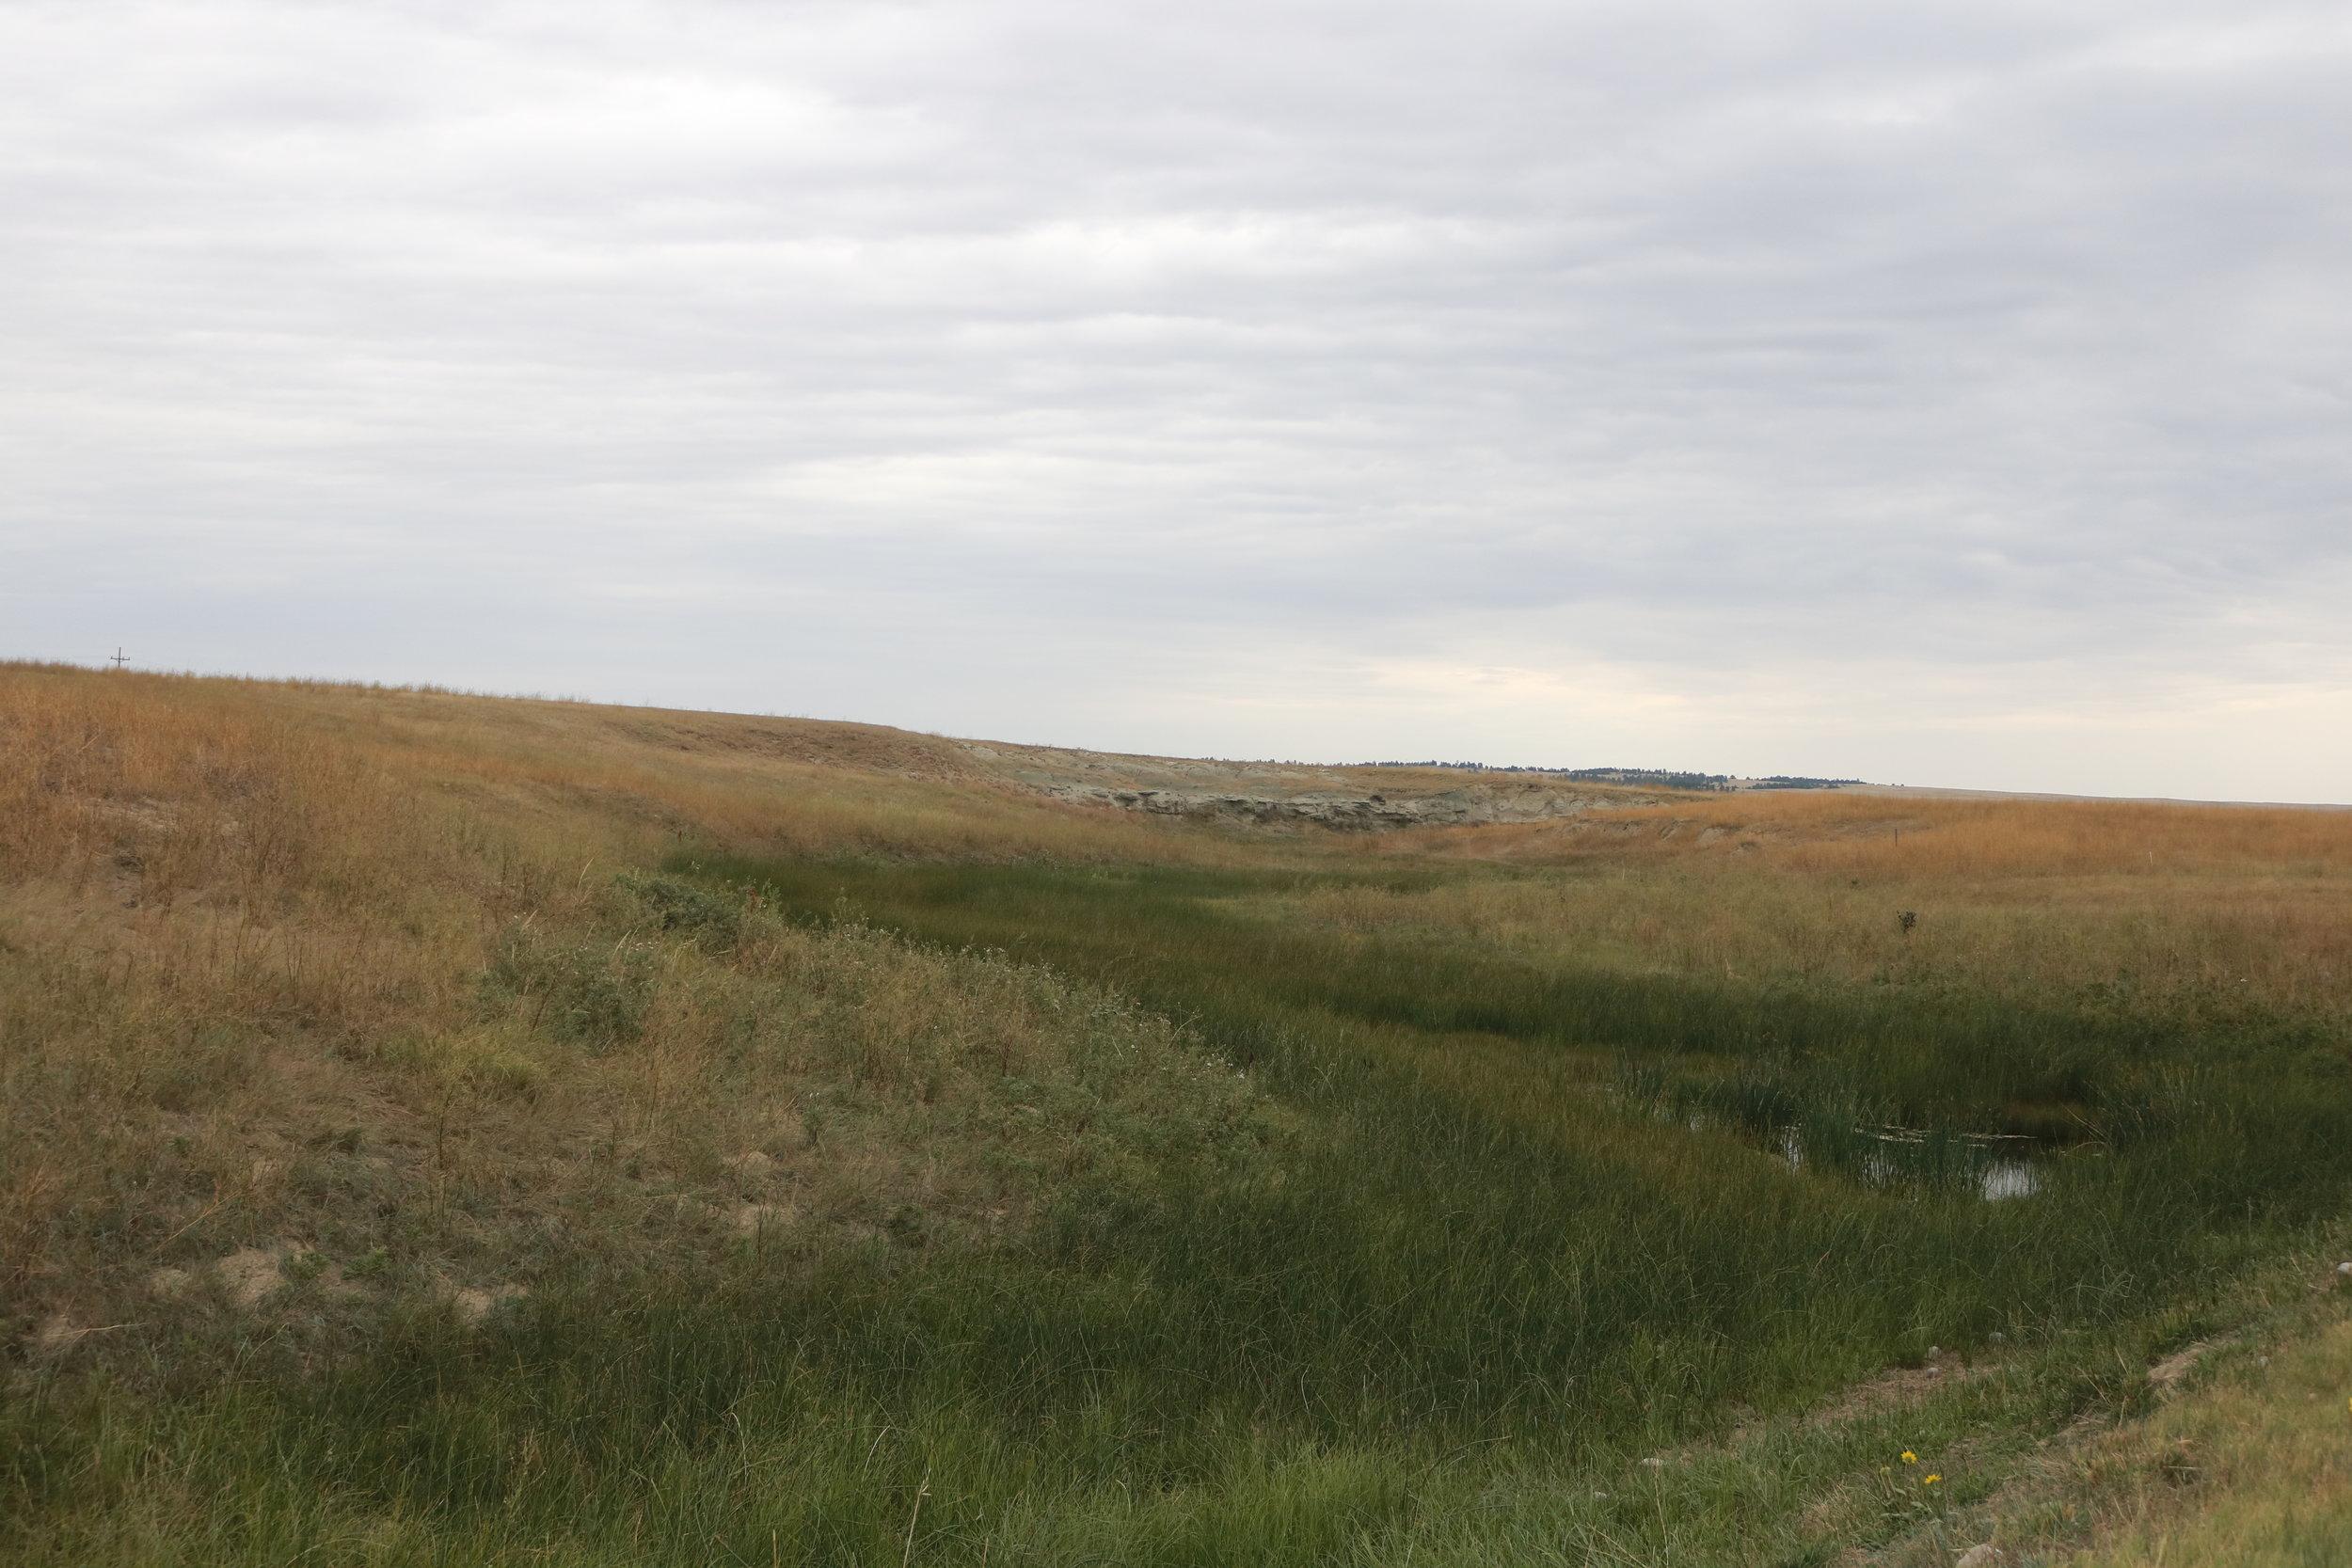 Wetland resilience